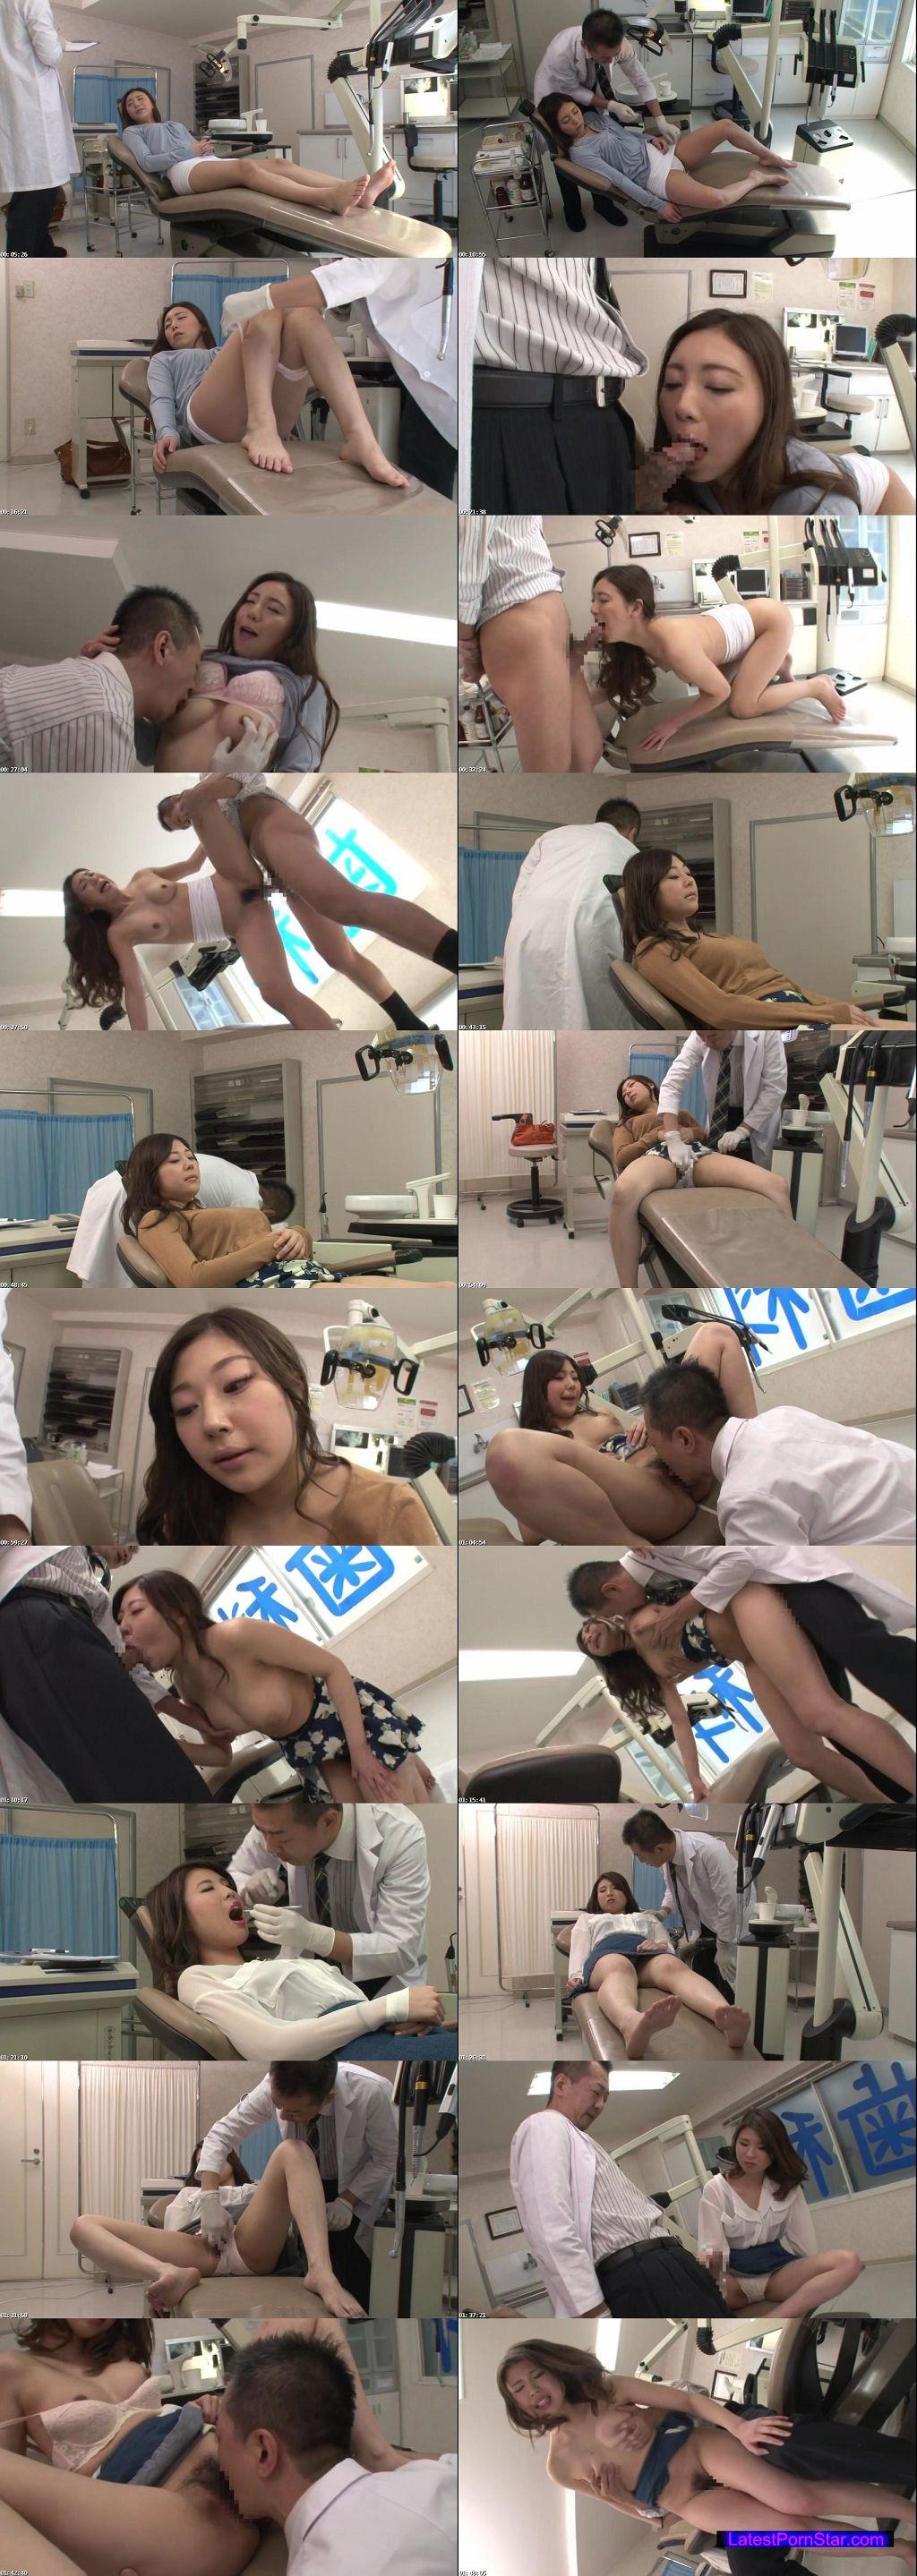 [GS-050] 歯の治療中に居眠りするソソるお姉さんの美しい寝顔と唇に思わず勃起!!ごまかそうとしたら、からかいながら勃起チ○ポを触りだし、抜いてくれた!!